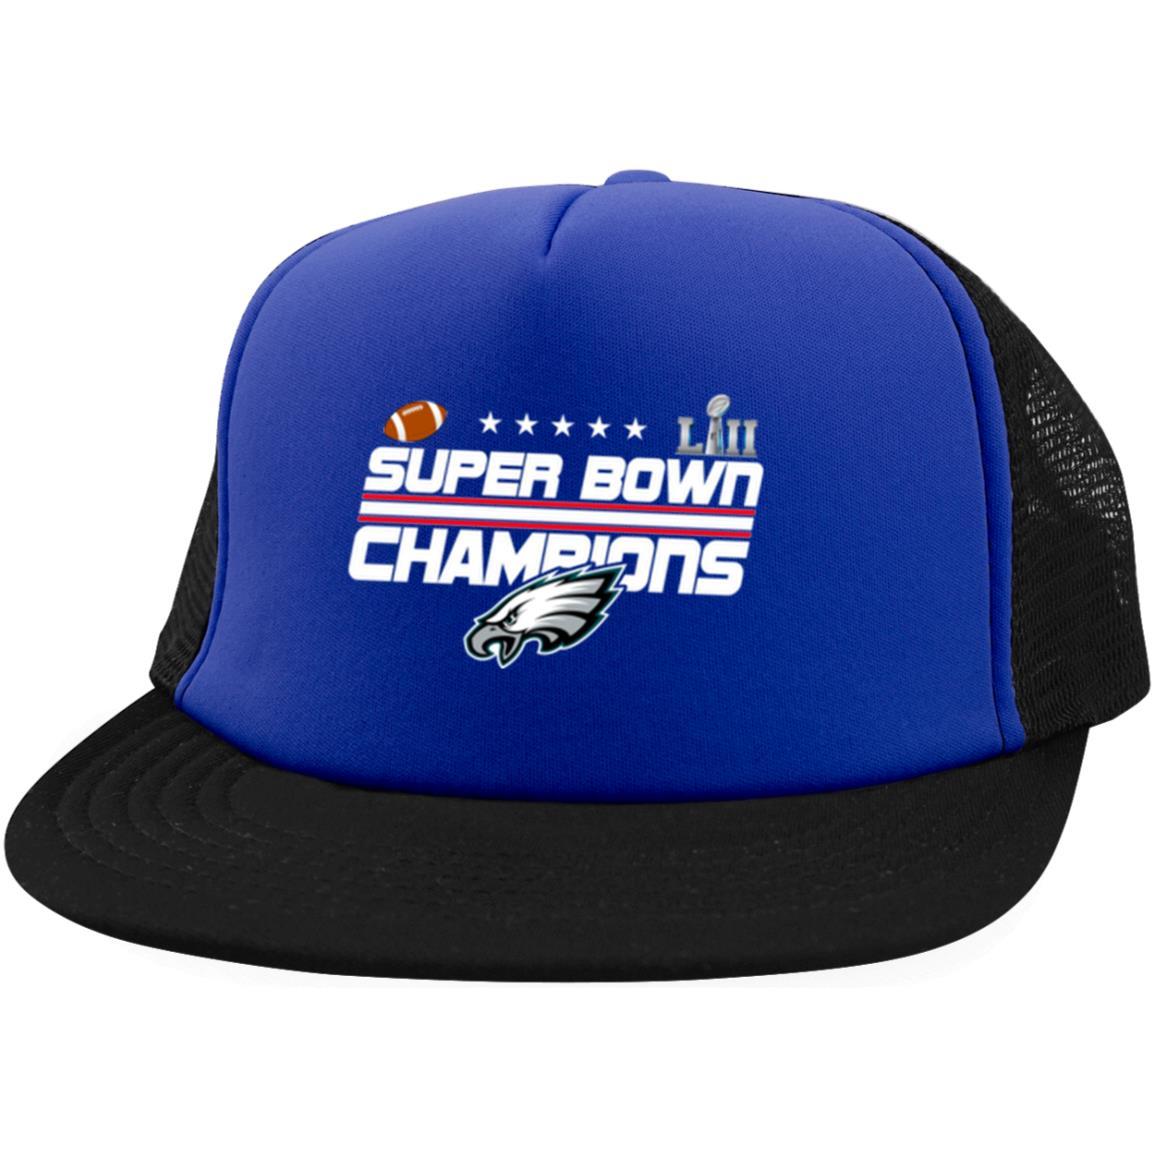 image 259 - Eagles Super Bowl Champions Hats